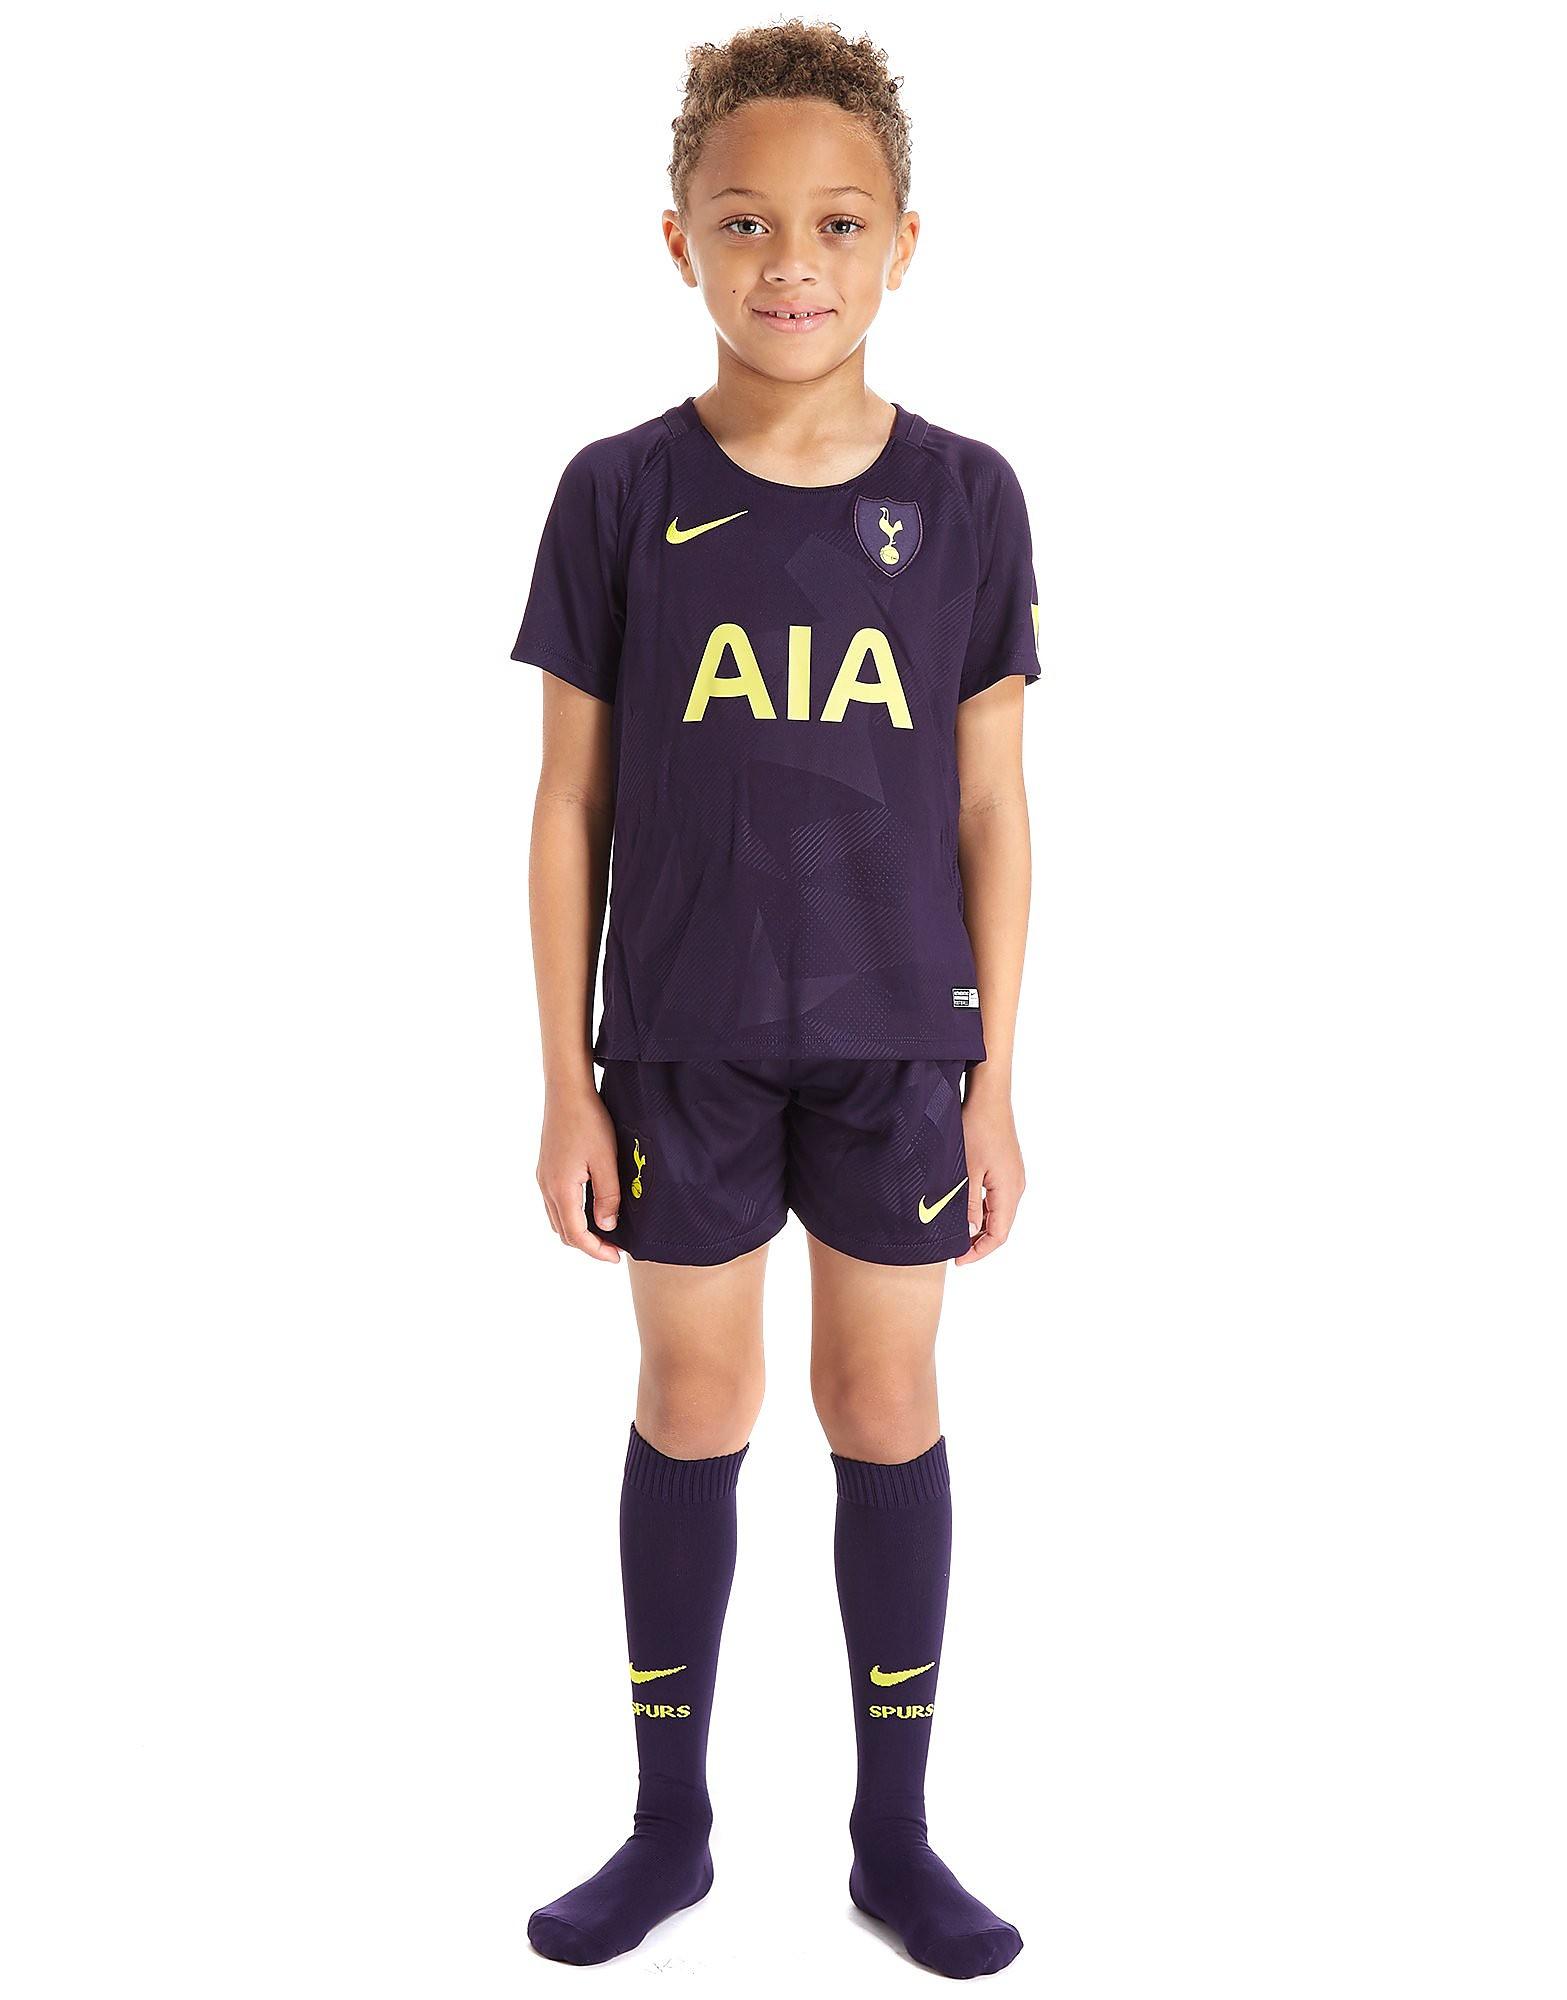 Nike Tottenham Hotspur 2017/18 Third Kit Children